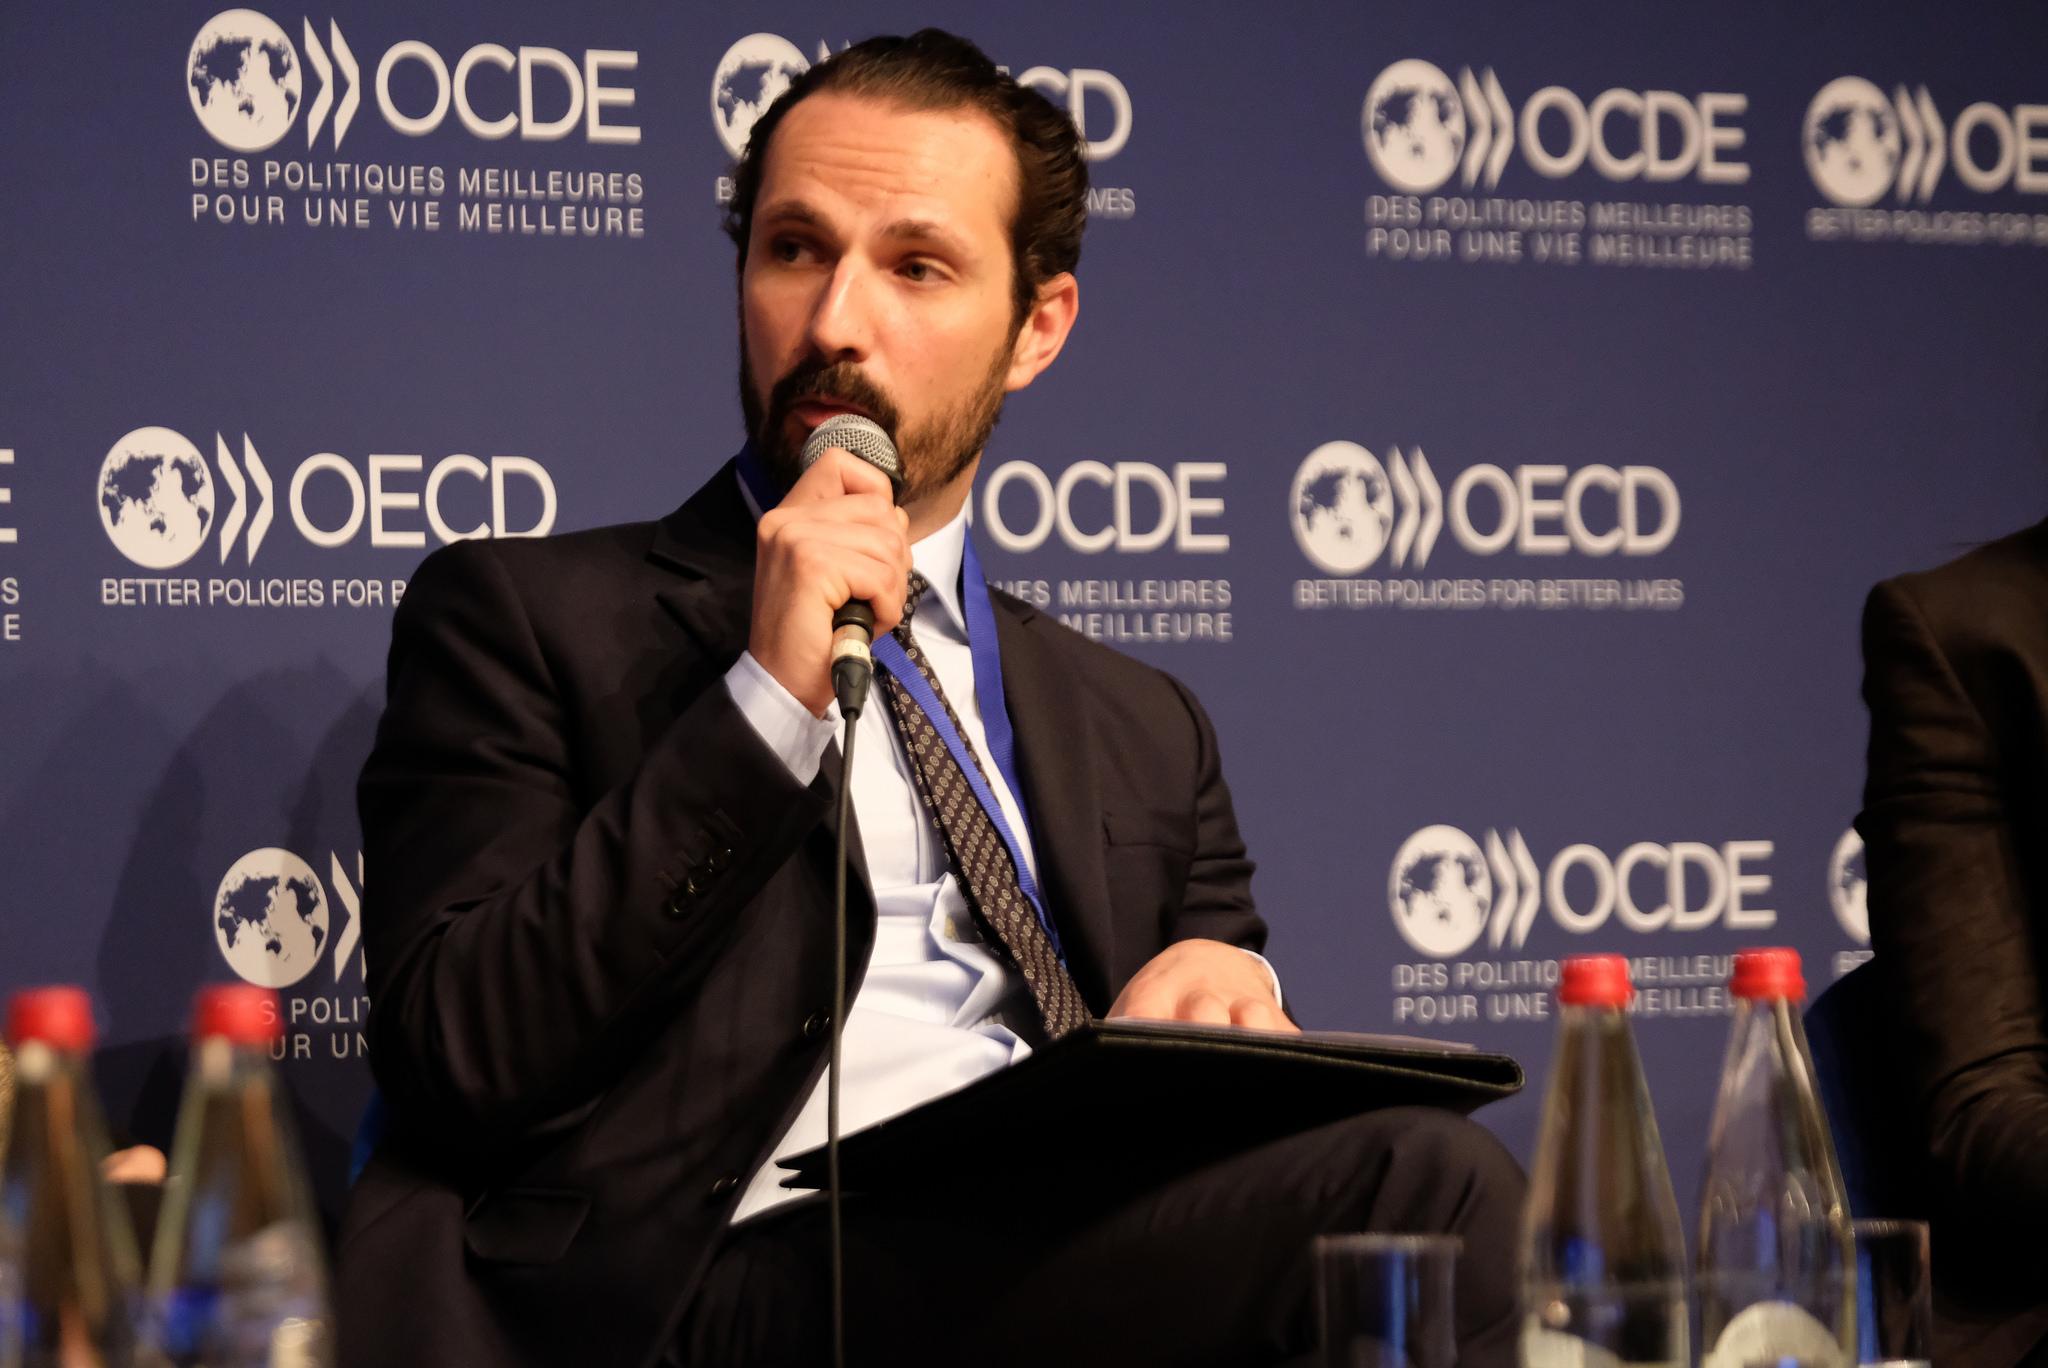 Aleph Molinari, President, Fundación Proacceso